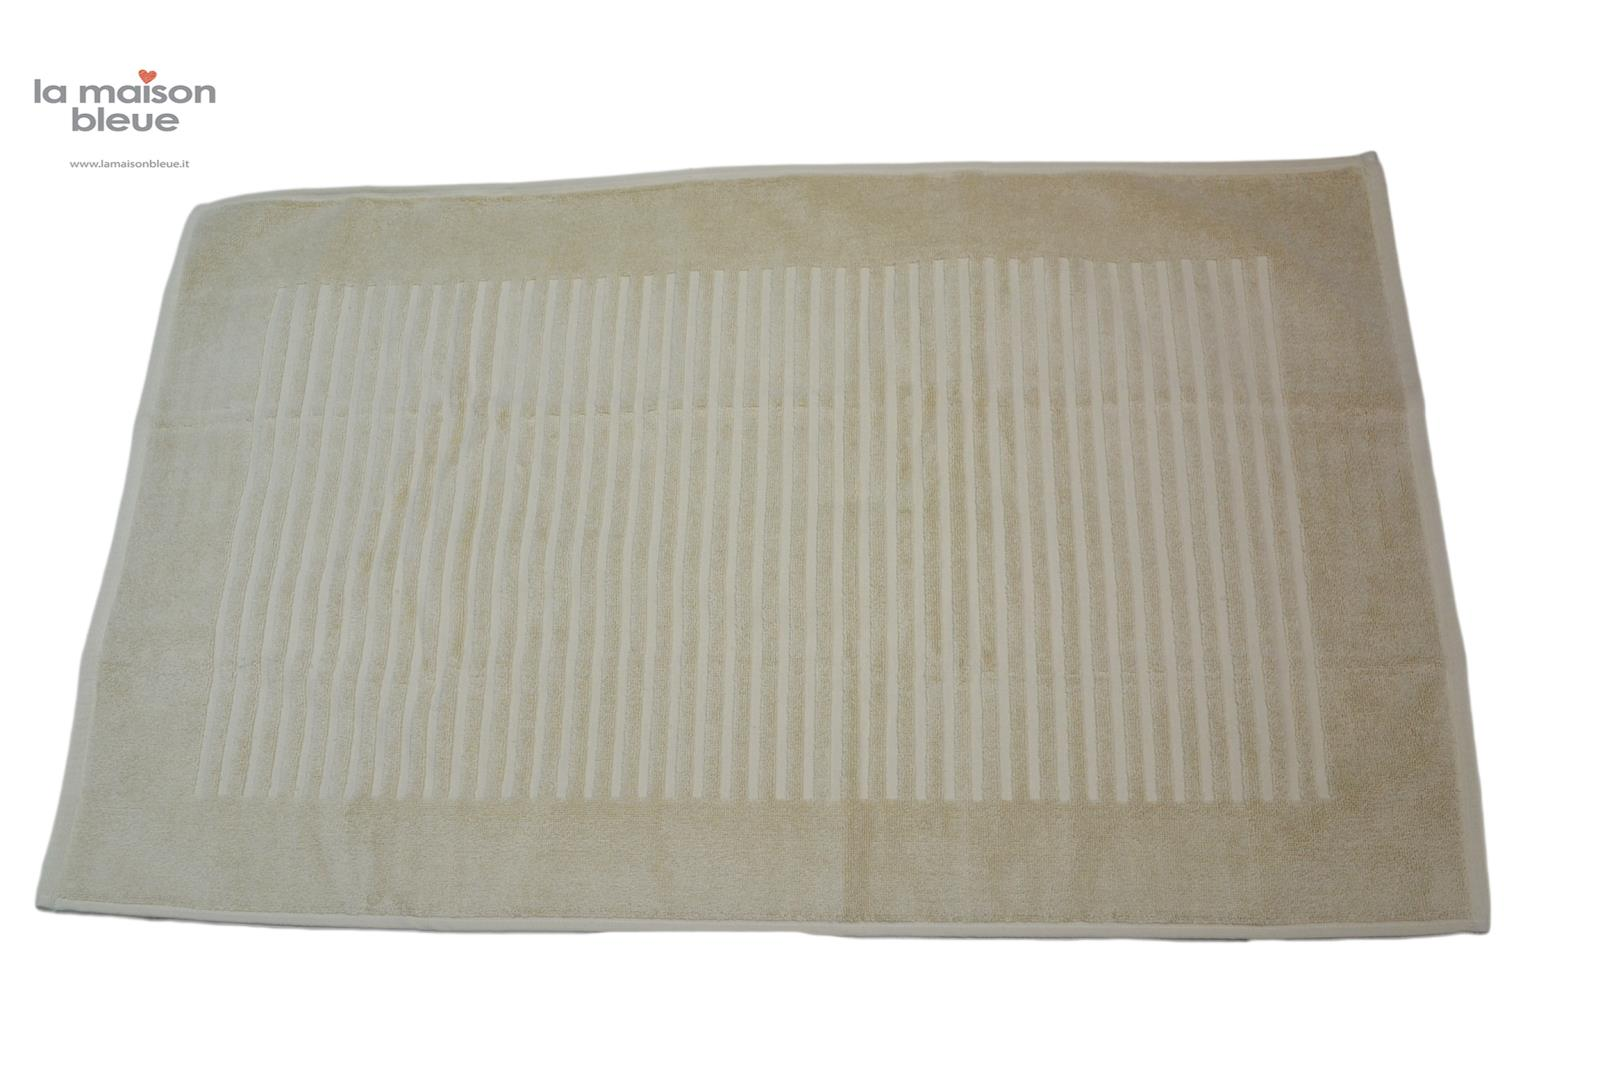 Tappeto bagno blumarine tappeti bagno rotondi ikea u - Ikea porta spugne ...